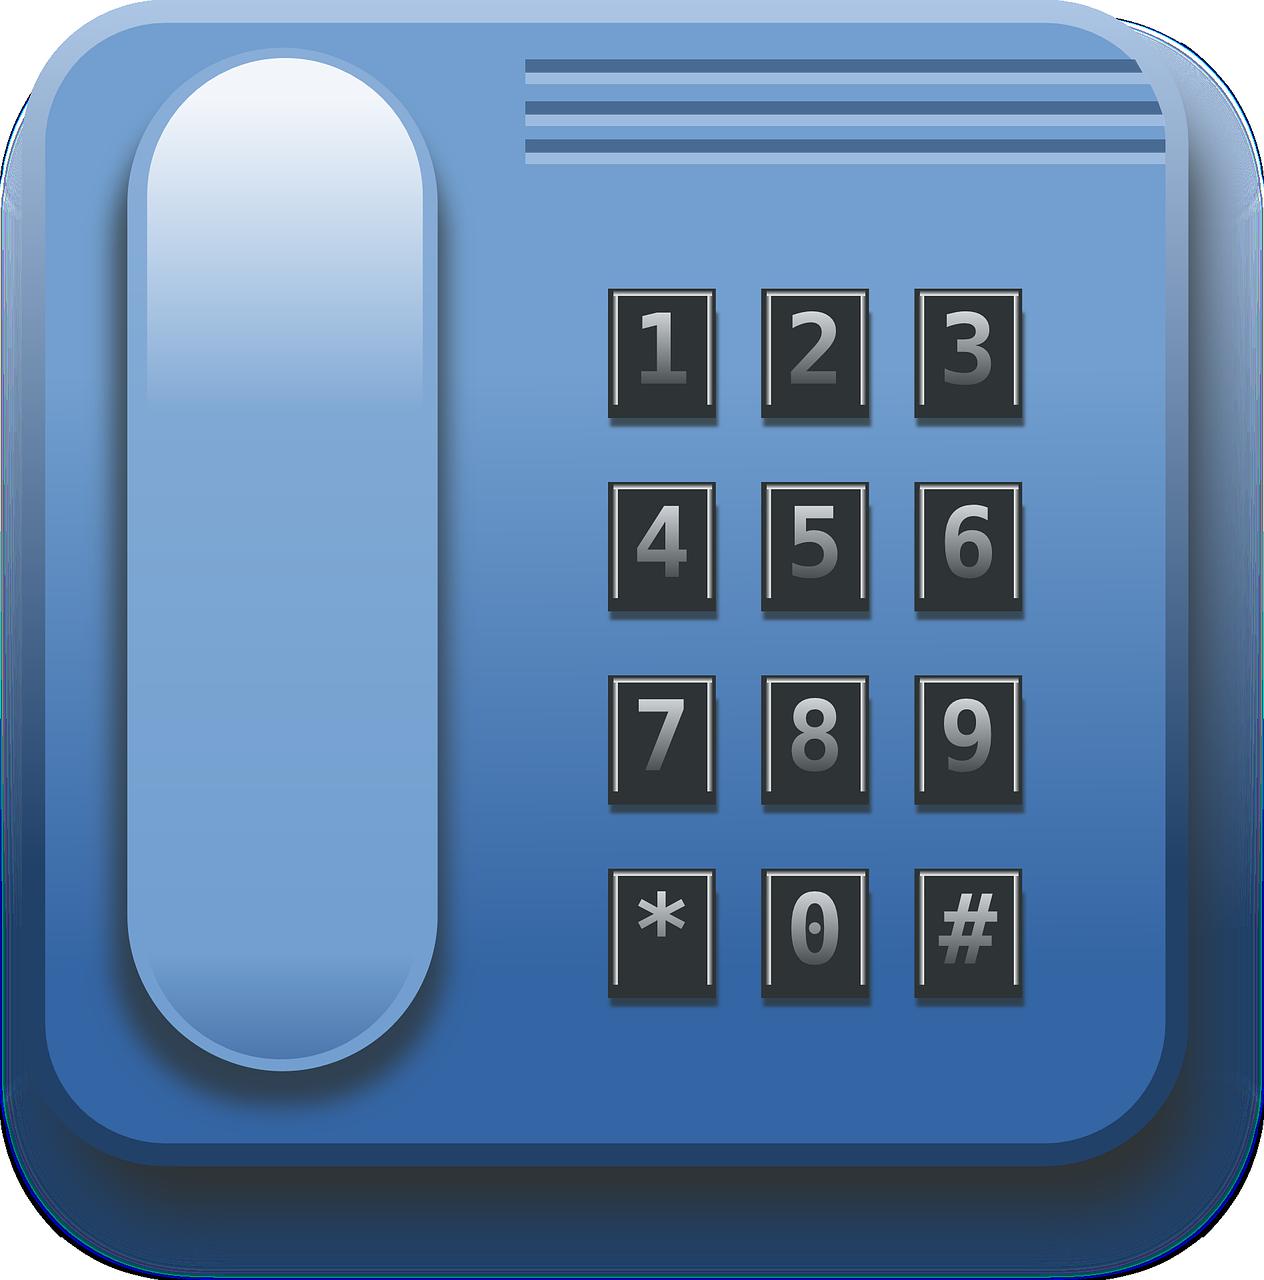 Demo Phone